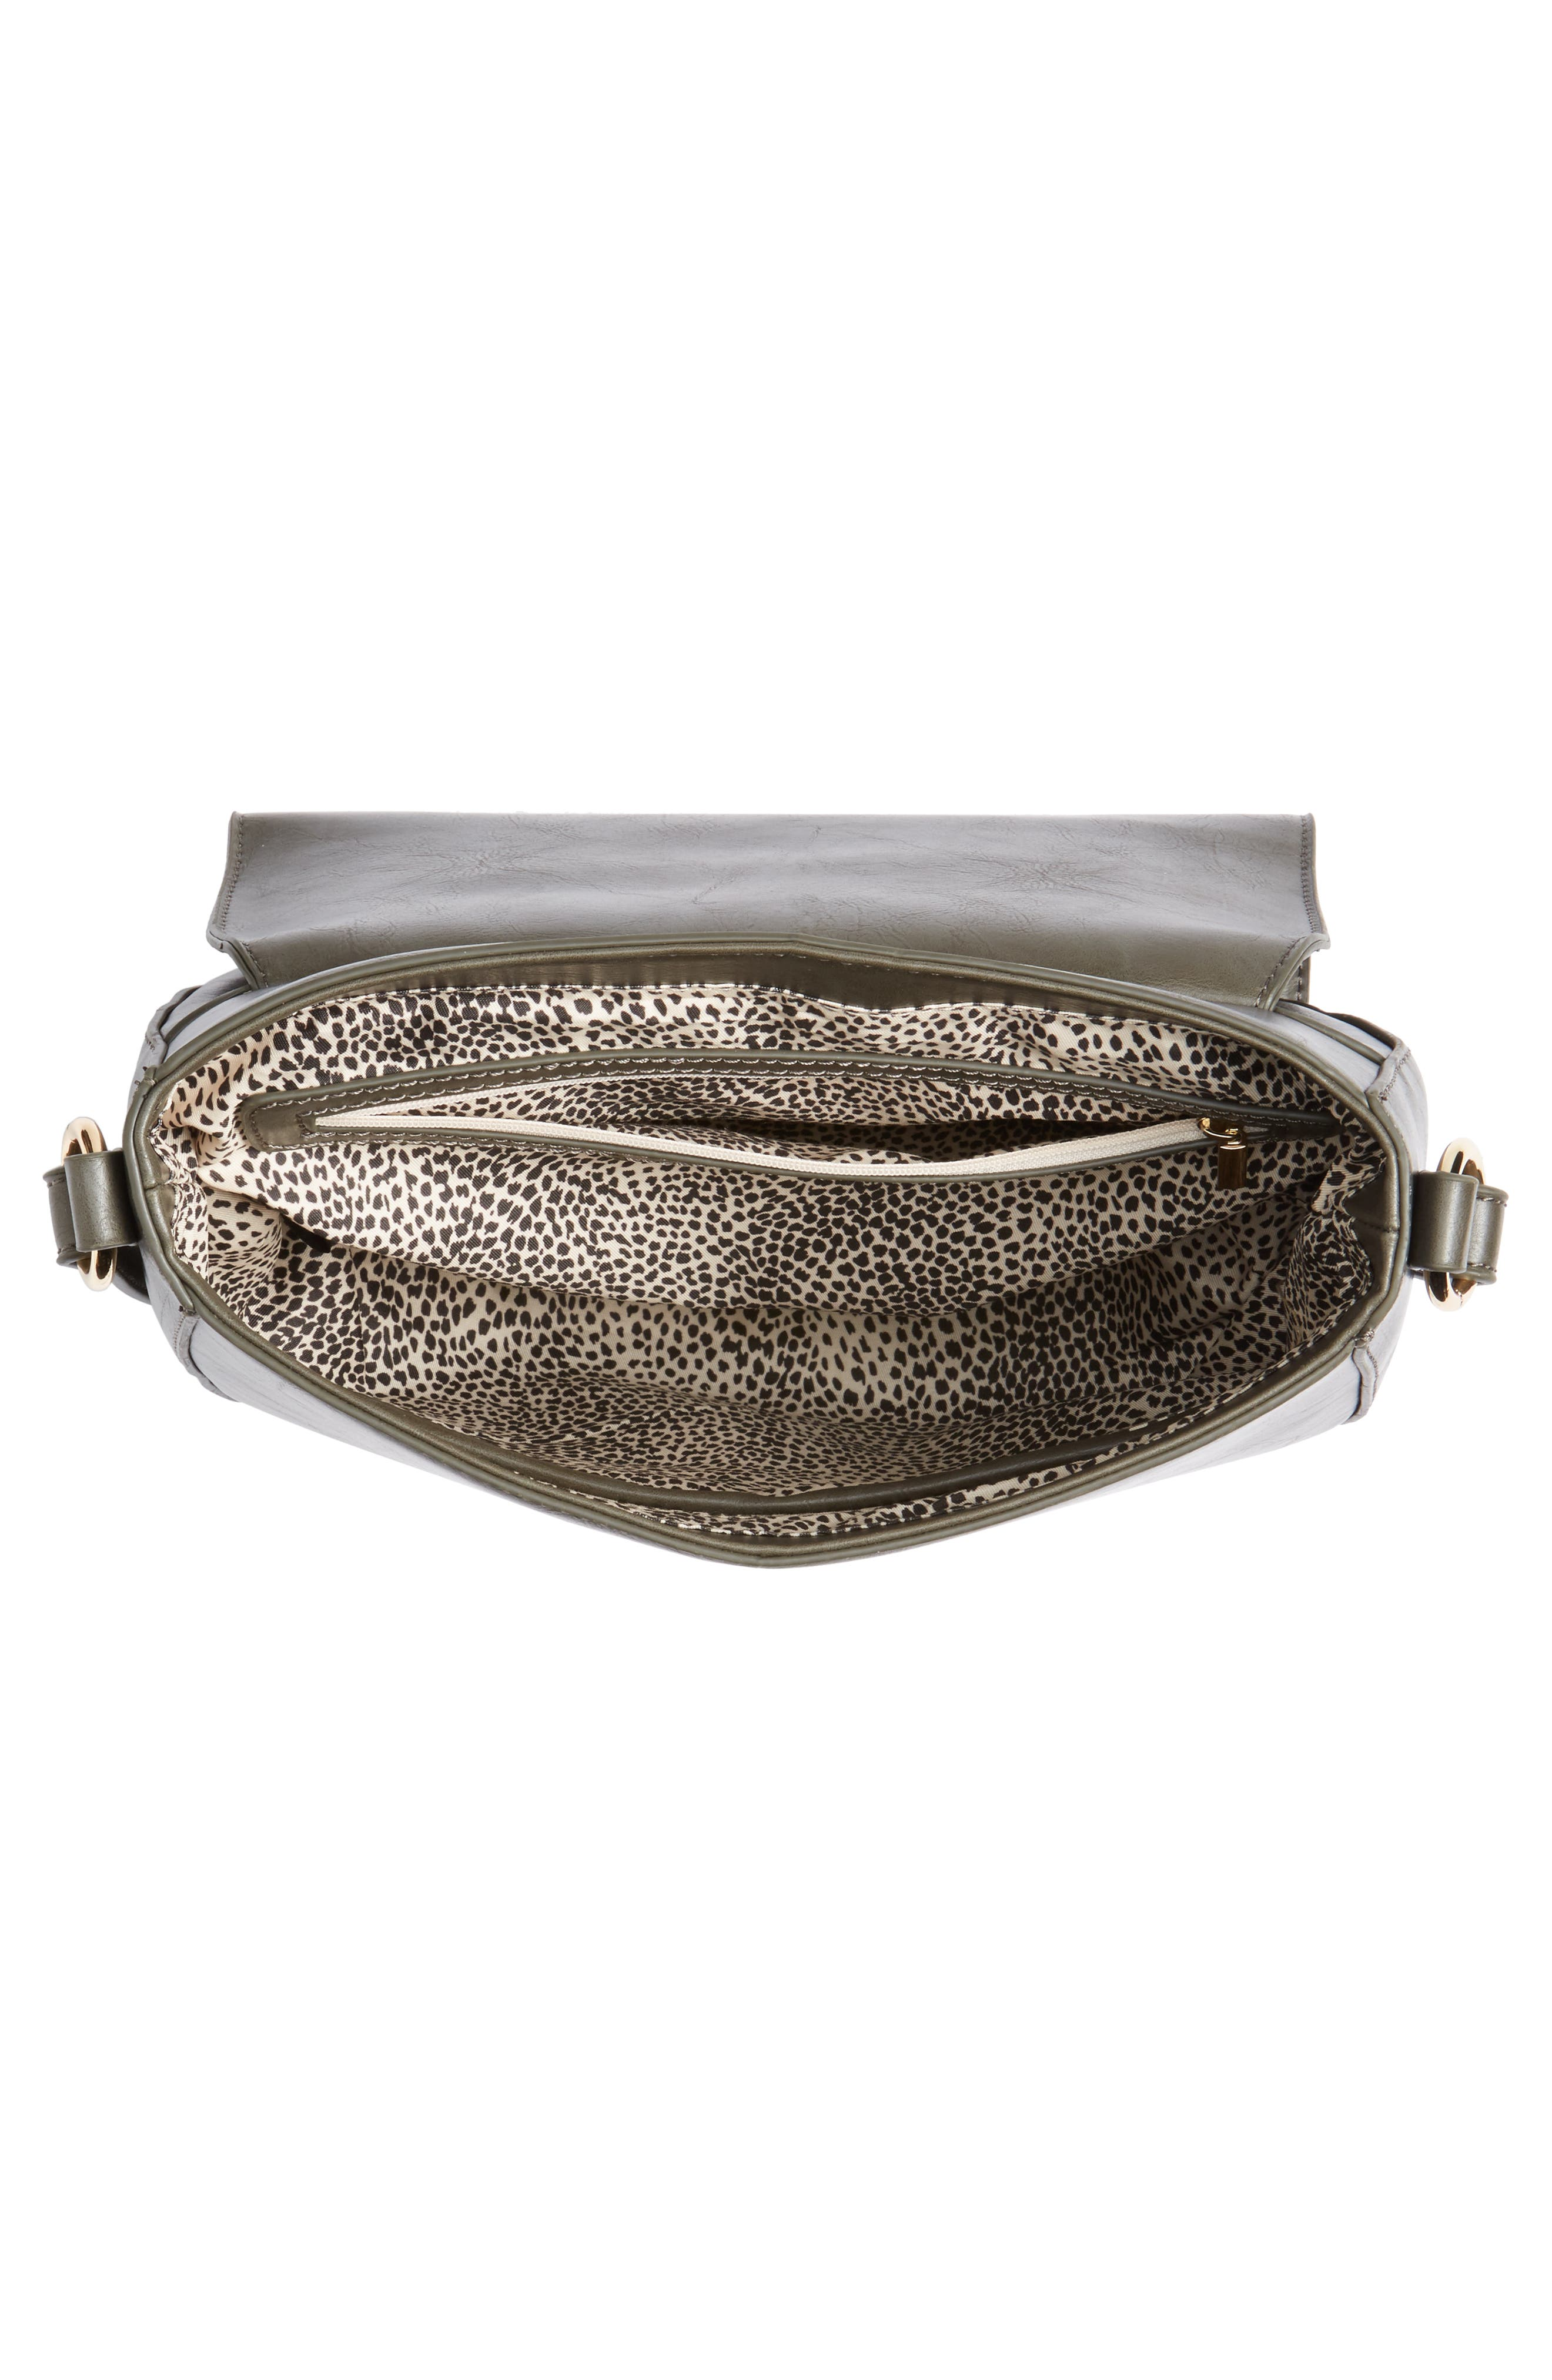 Piri Faux Leather Saddle Bag,                             Alternate thumbnail 11, color,